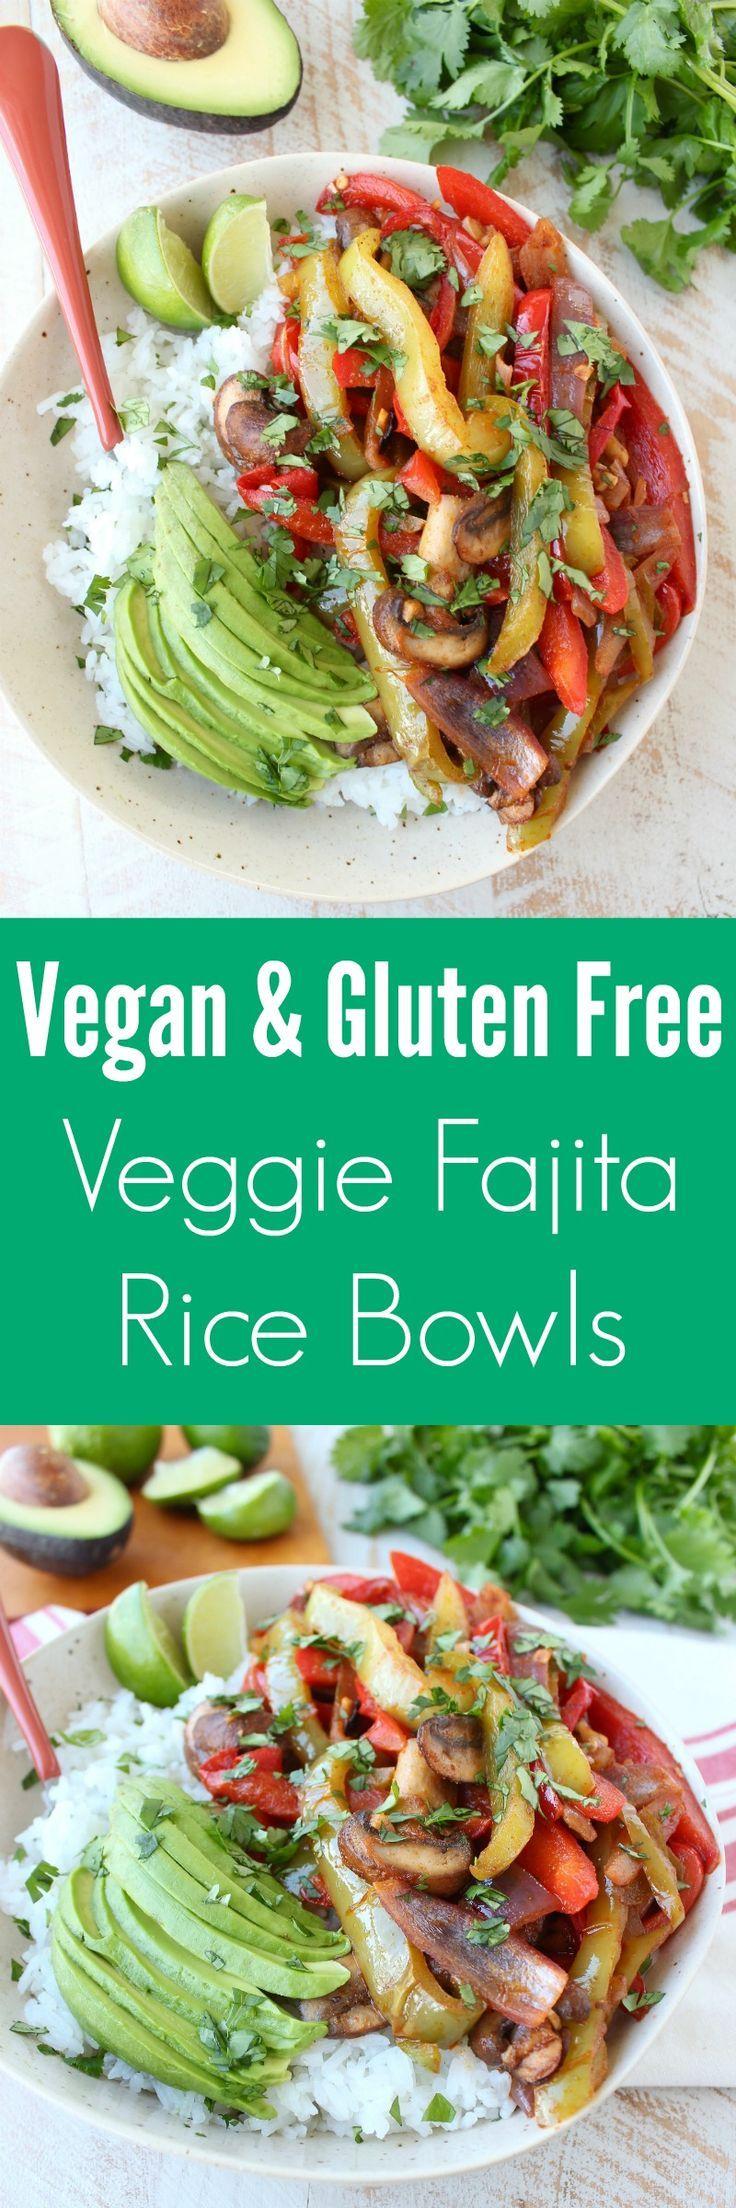 Saut�ed, seasoned veggies are served on top of cilantro lime rice with fresh avocado for a flavorful, easy to make, vegan & gluten free fajita recipe!